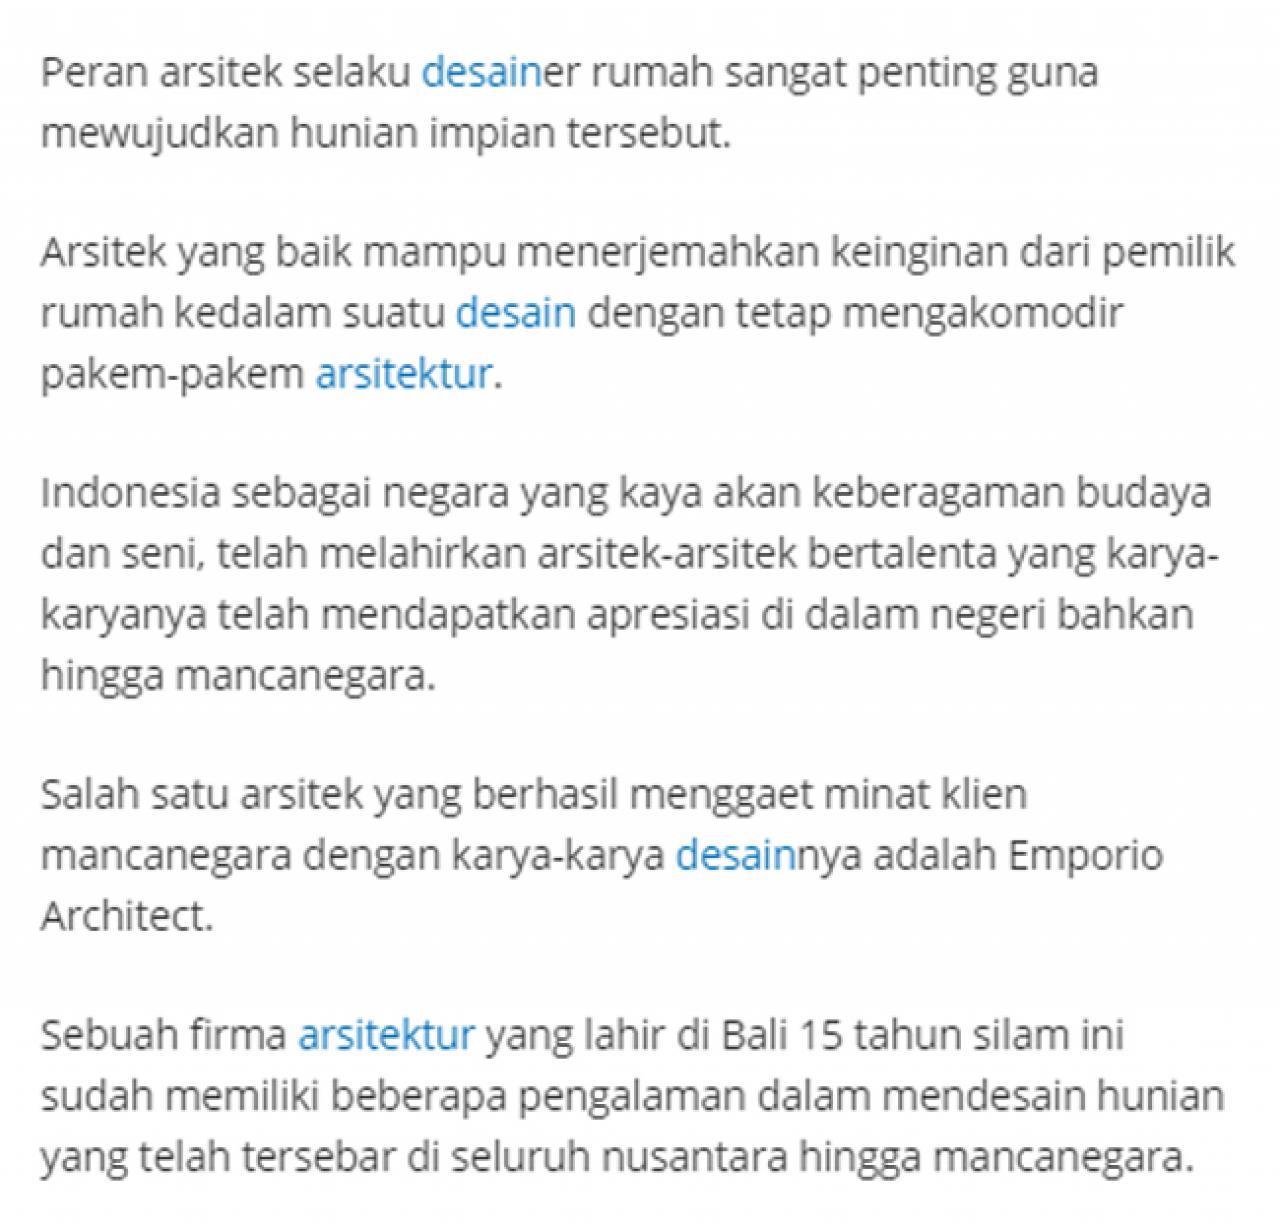 Ulasan Media TribunJakarta.com - Wujudkan Hunian Impian Bersama Emporio Architect, Karya Anak Bangsa yang Sukses Tembus Internasional 2 2